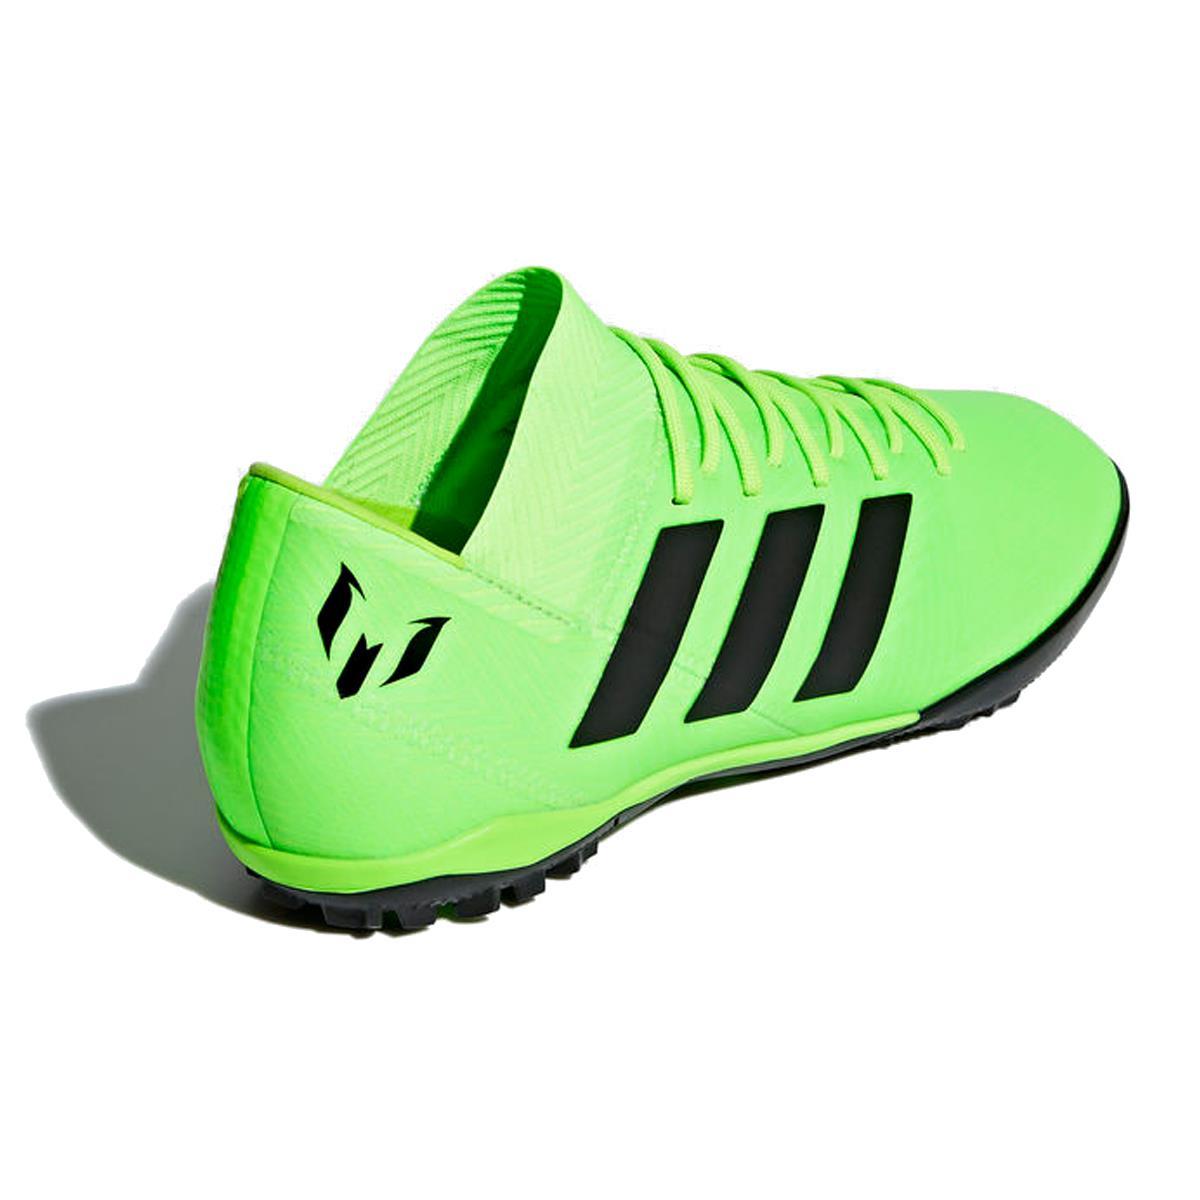 d2826897a Chuteira Society Adidas Nemeziz Messi Tango 18.3 Verde Limão